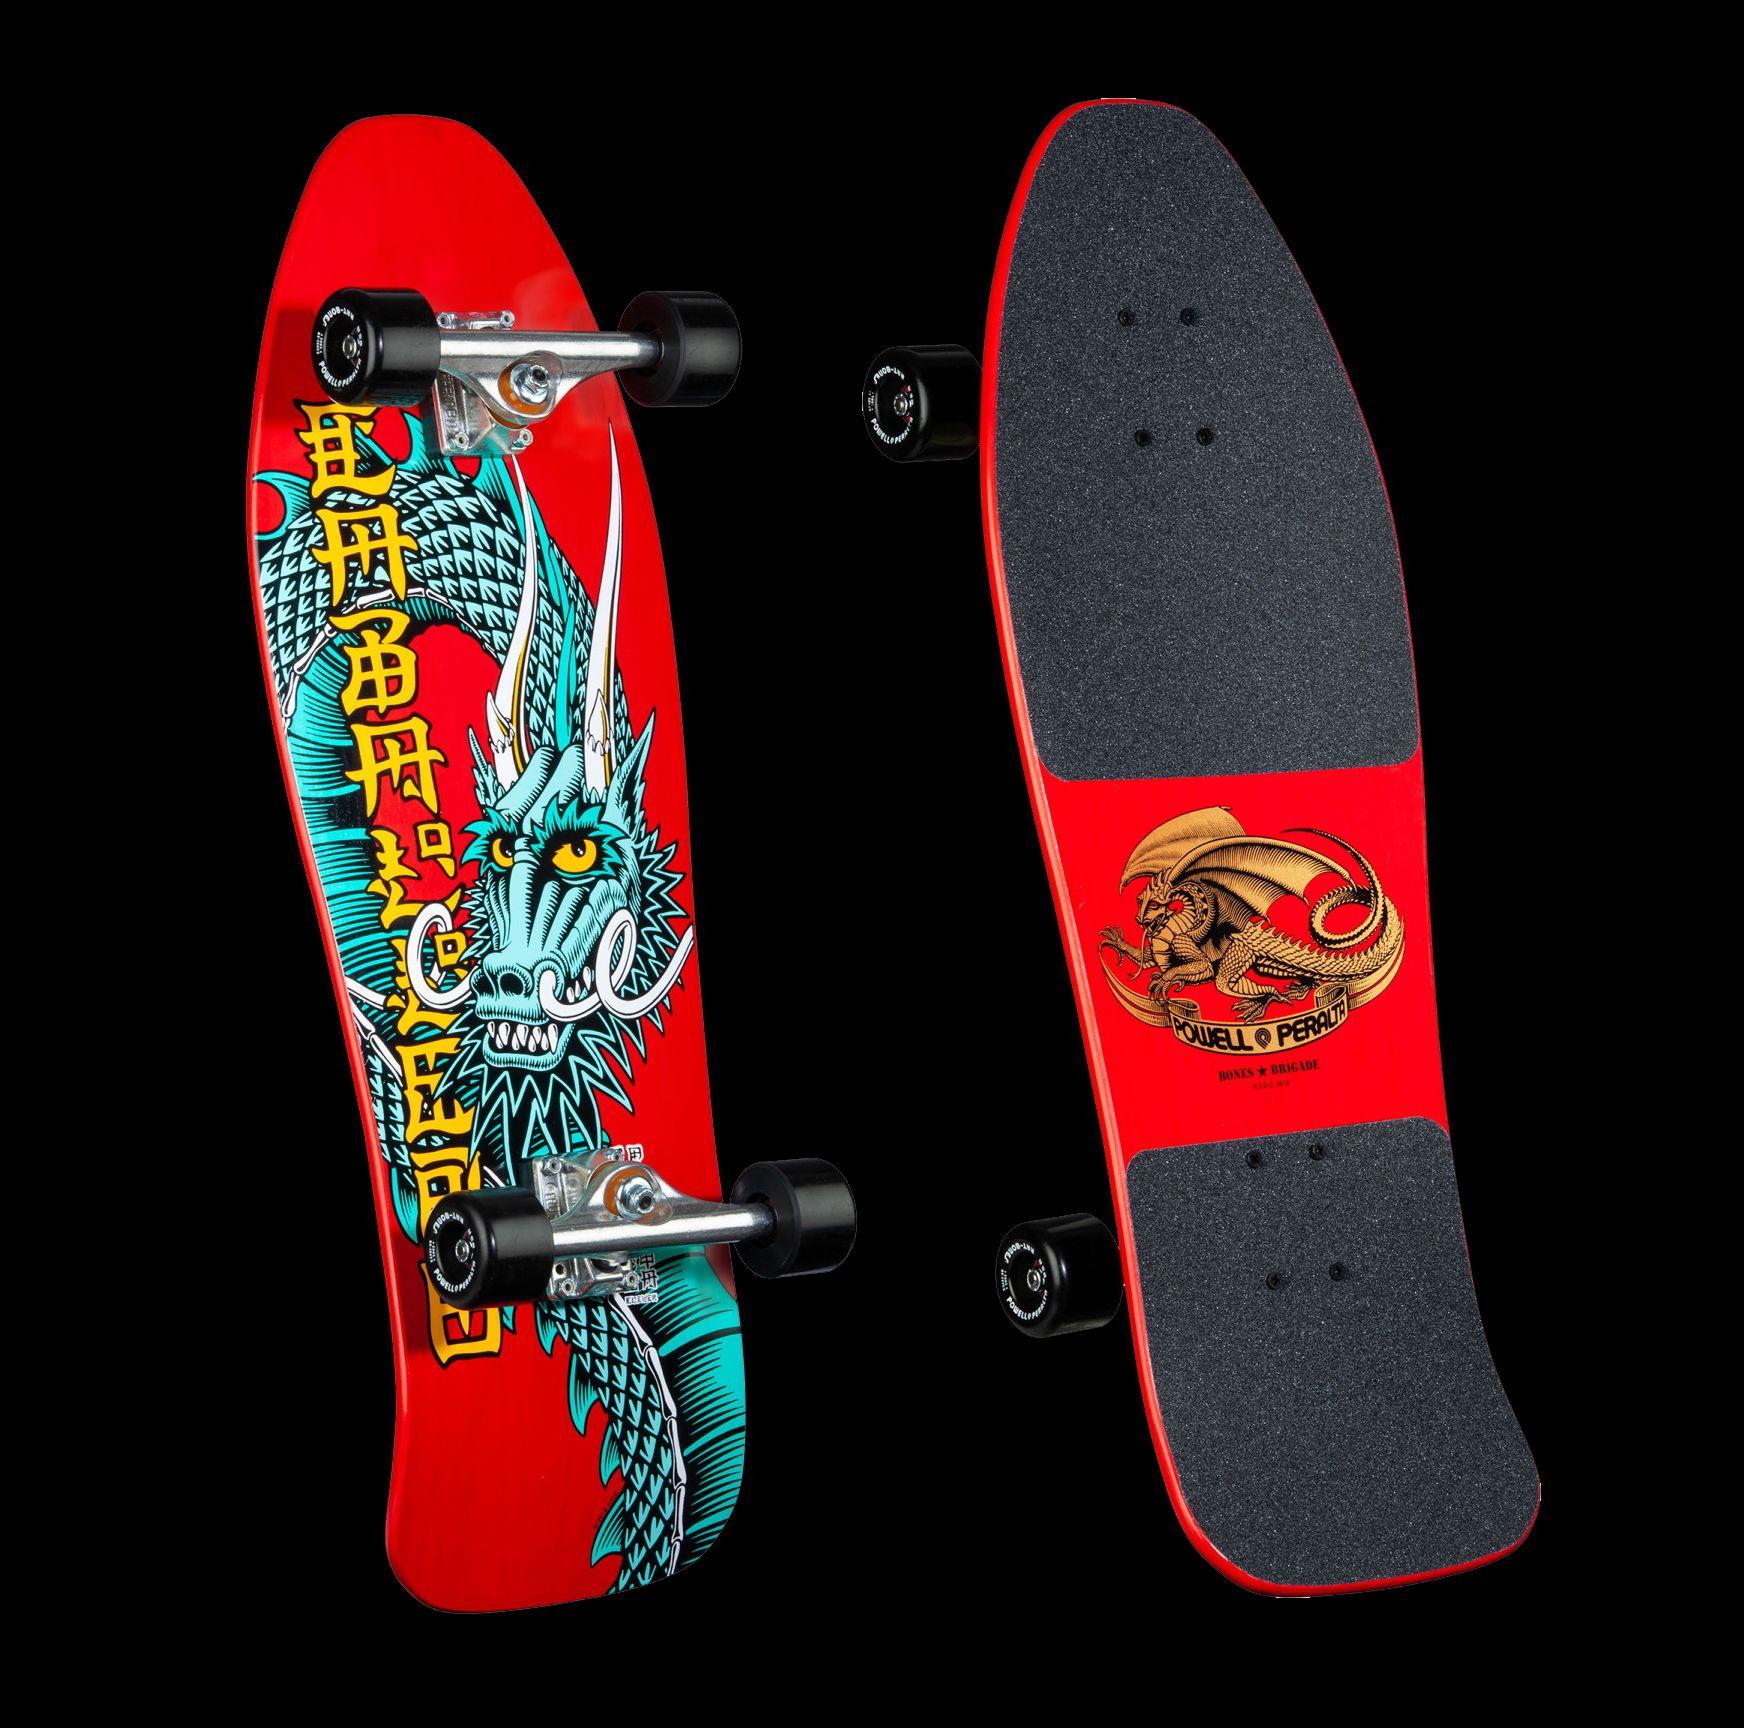 Bones Brigade Caballero Series 10 Skateboard Complete Red 10 47x 30 94 In 2020 Bones Brigade Grip Tape Designs Vintage Skateboards